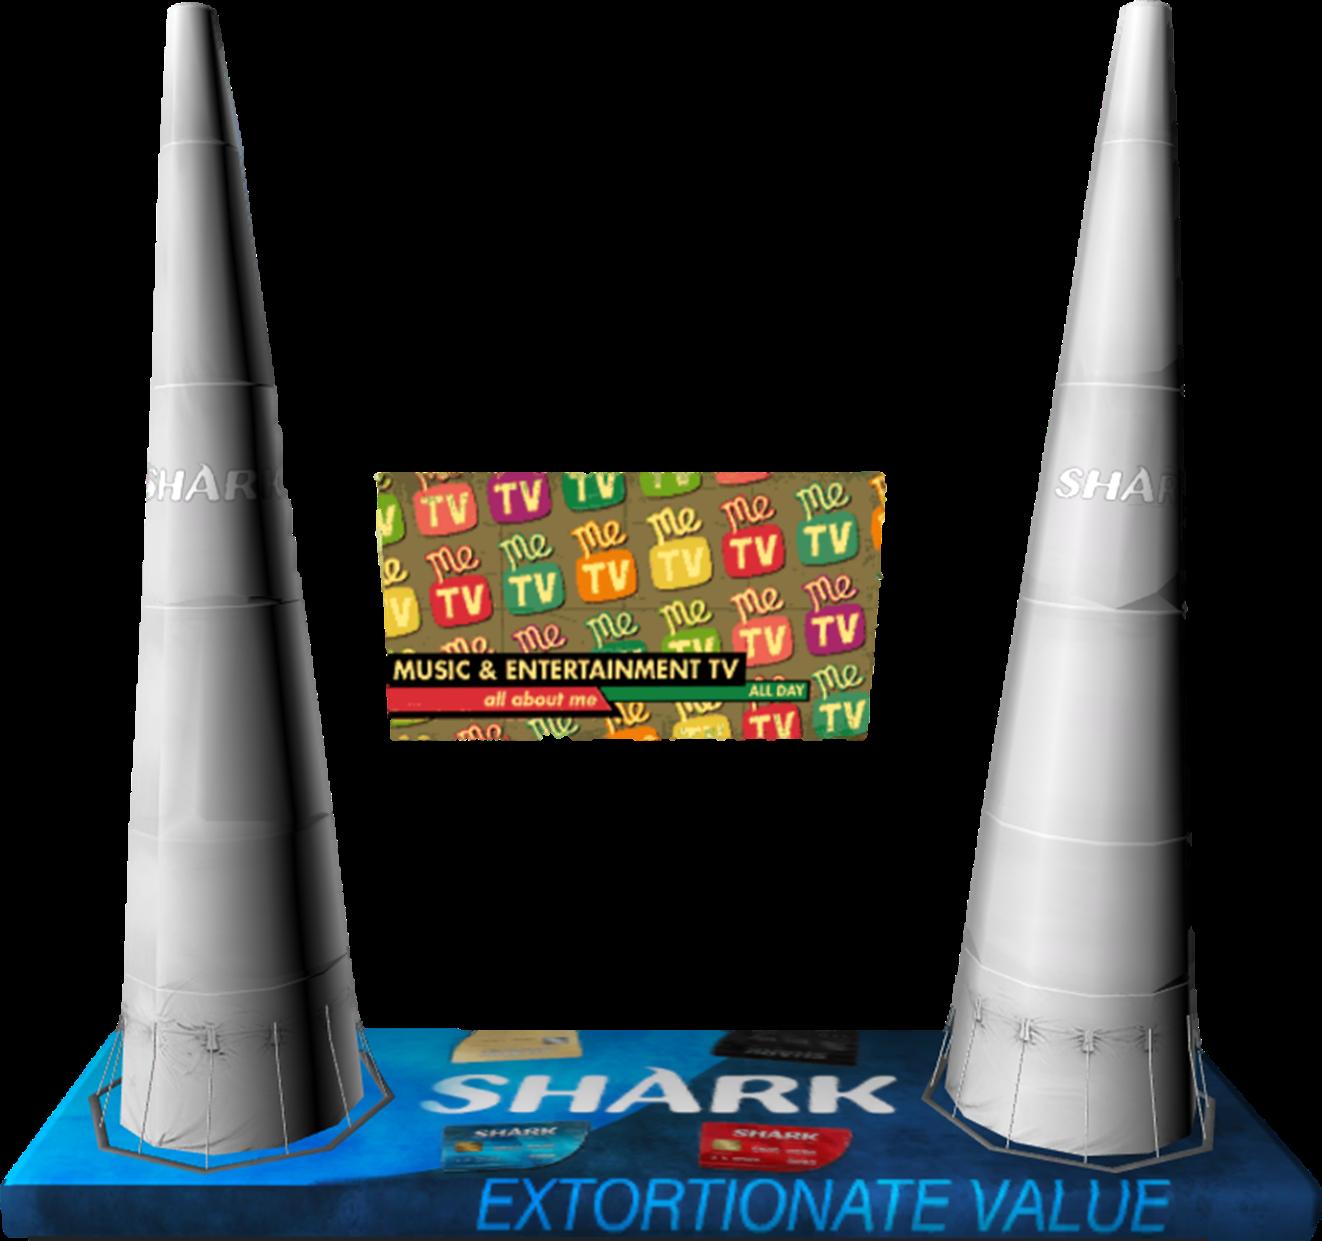 Aufblasbare Shark-Kegel.png